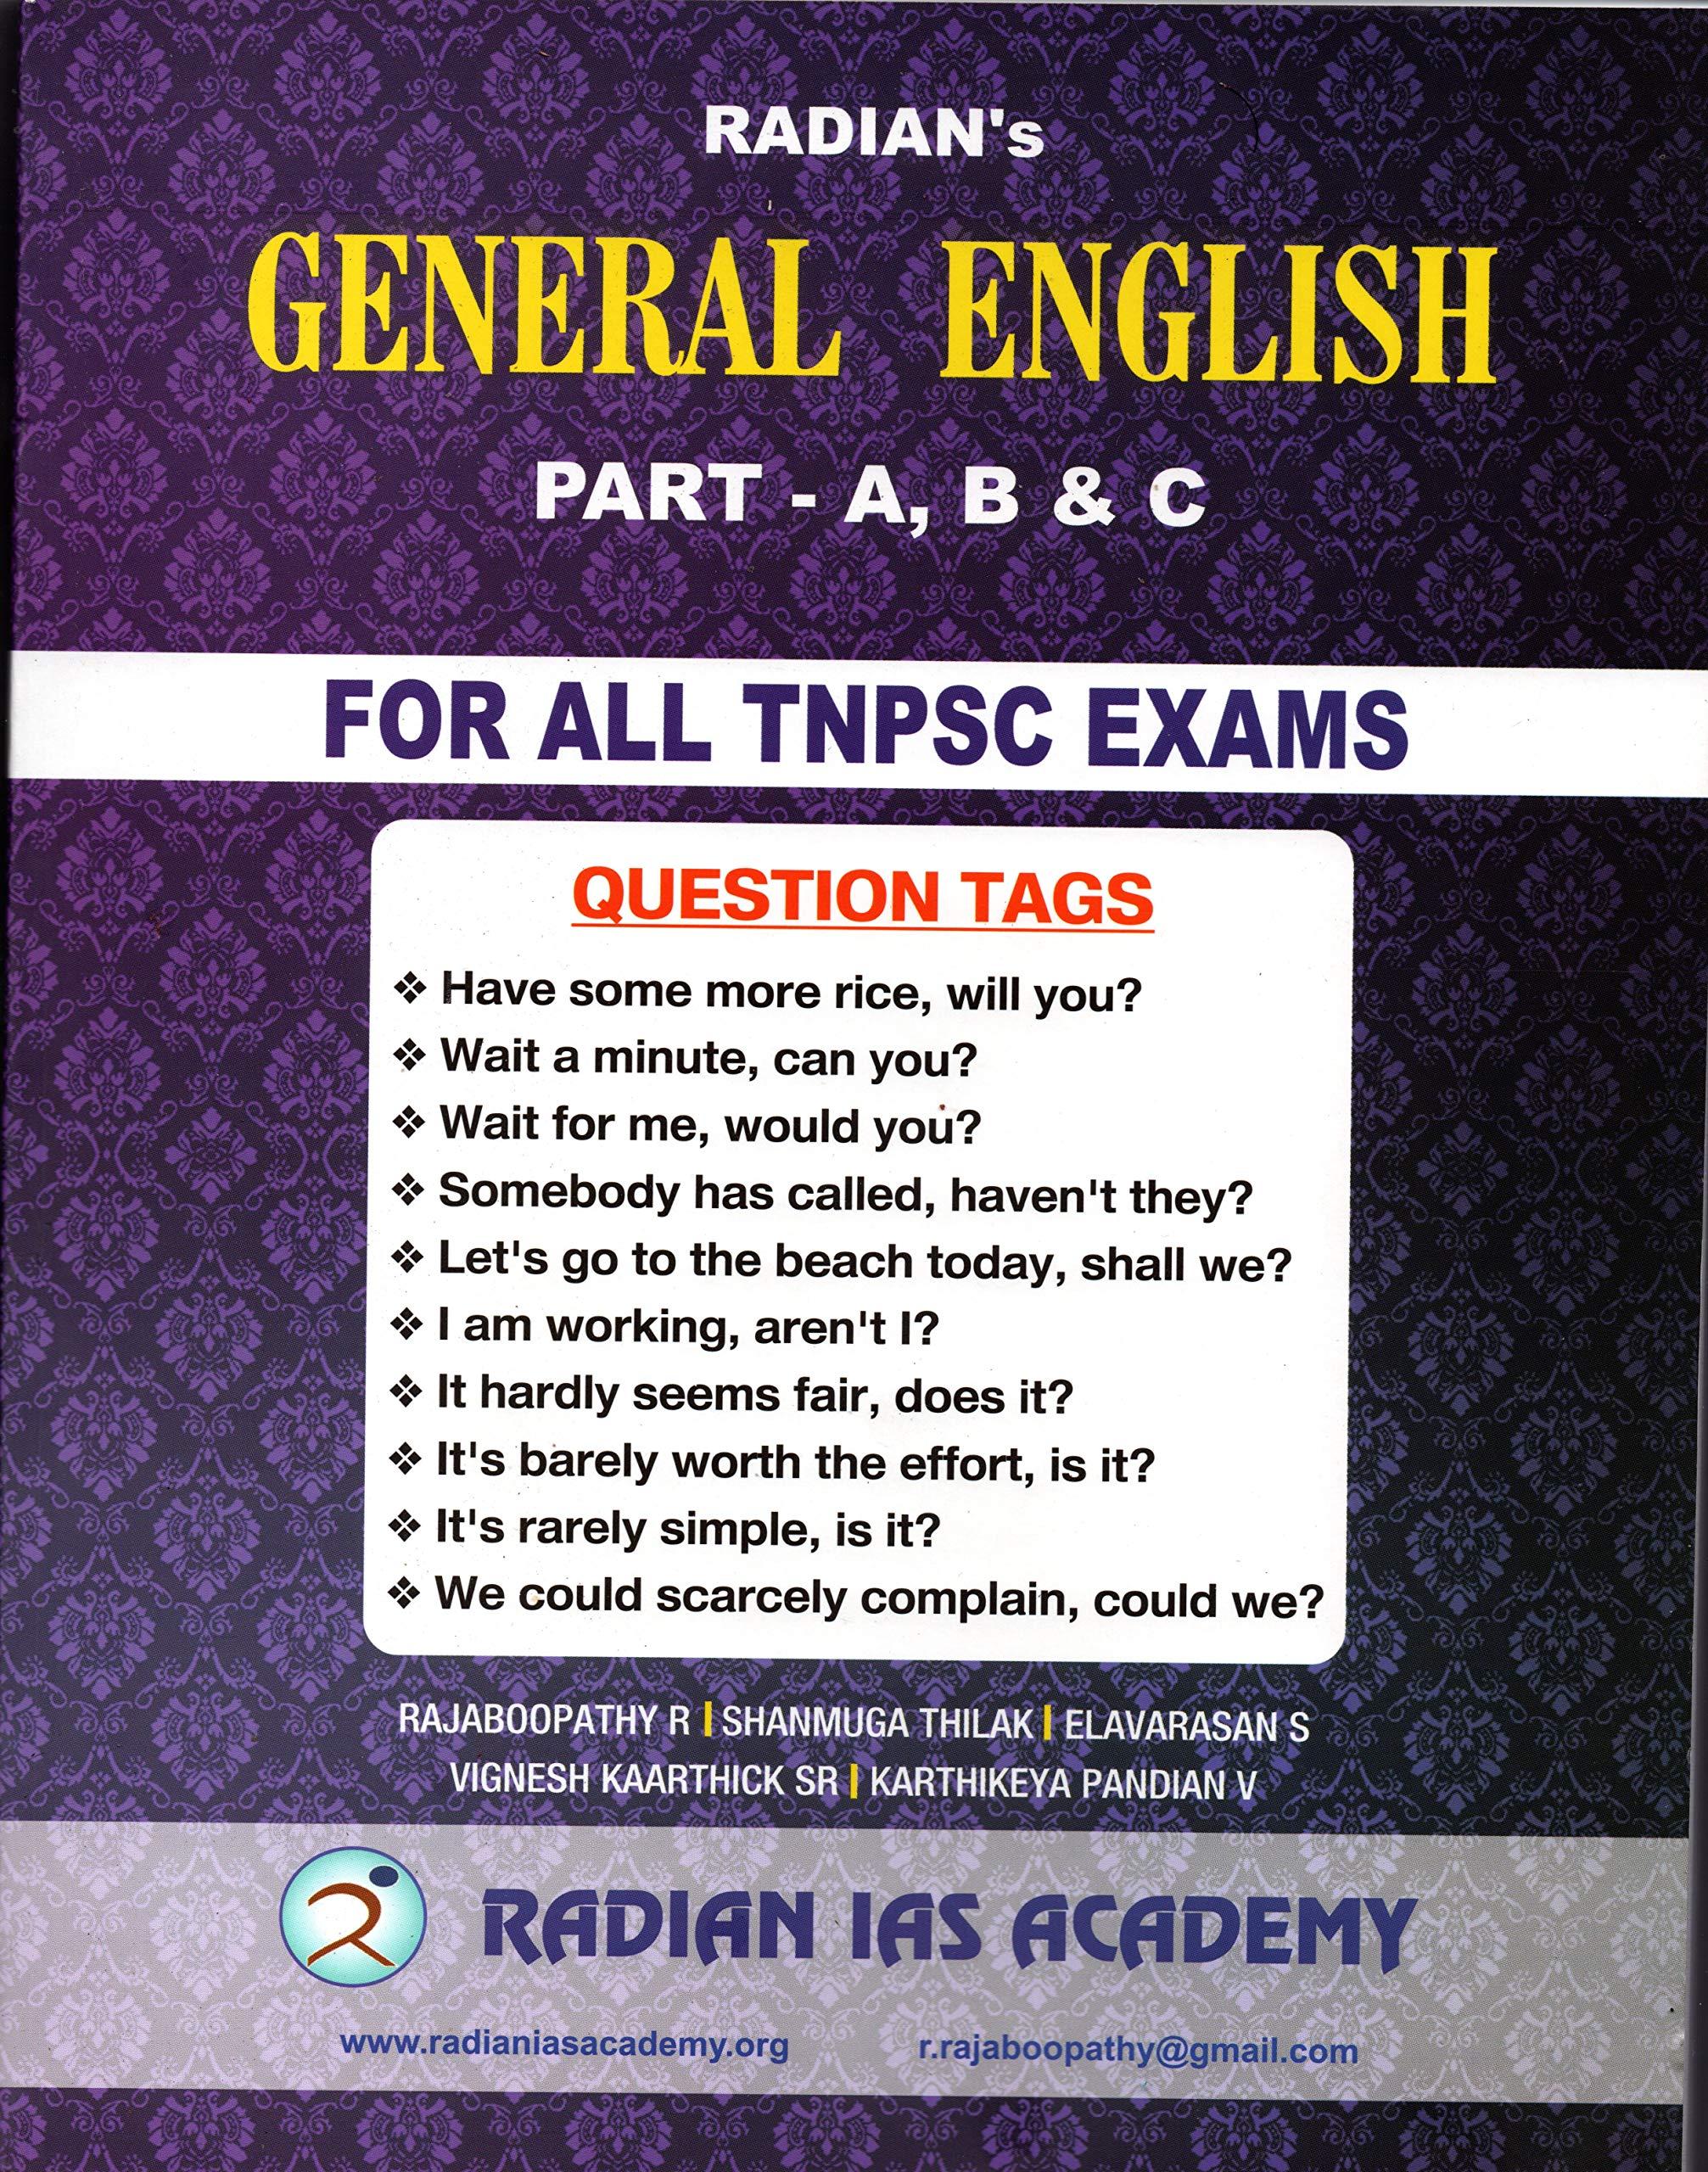 Buy GENERAL ENGLISH RADIAN's TNPSC BOOK (ENGLISH) Book